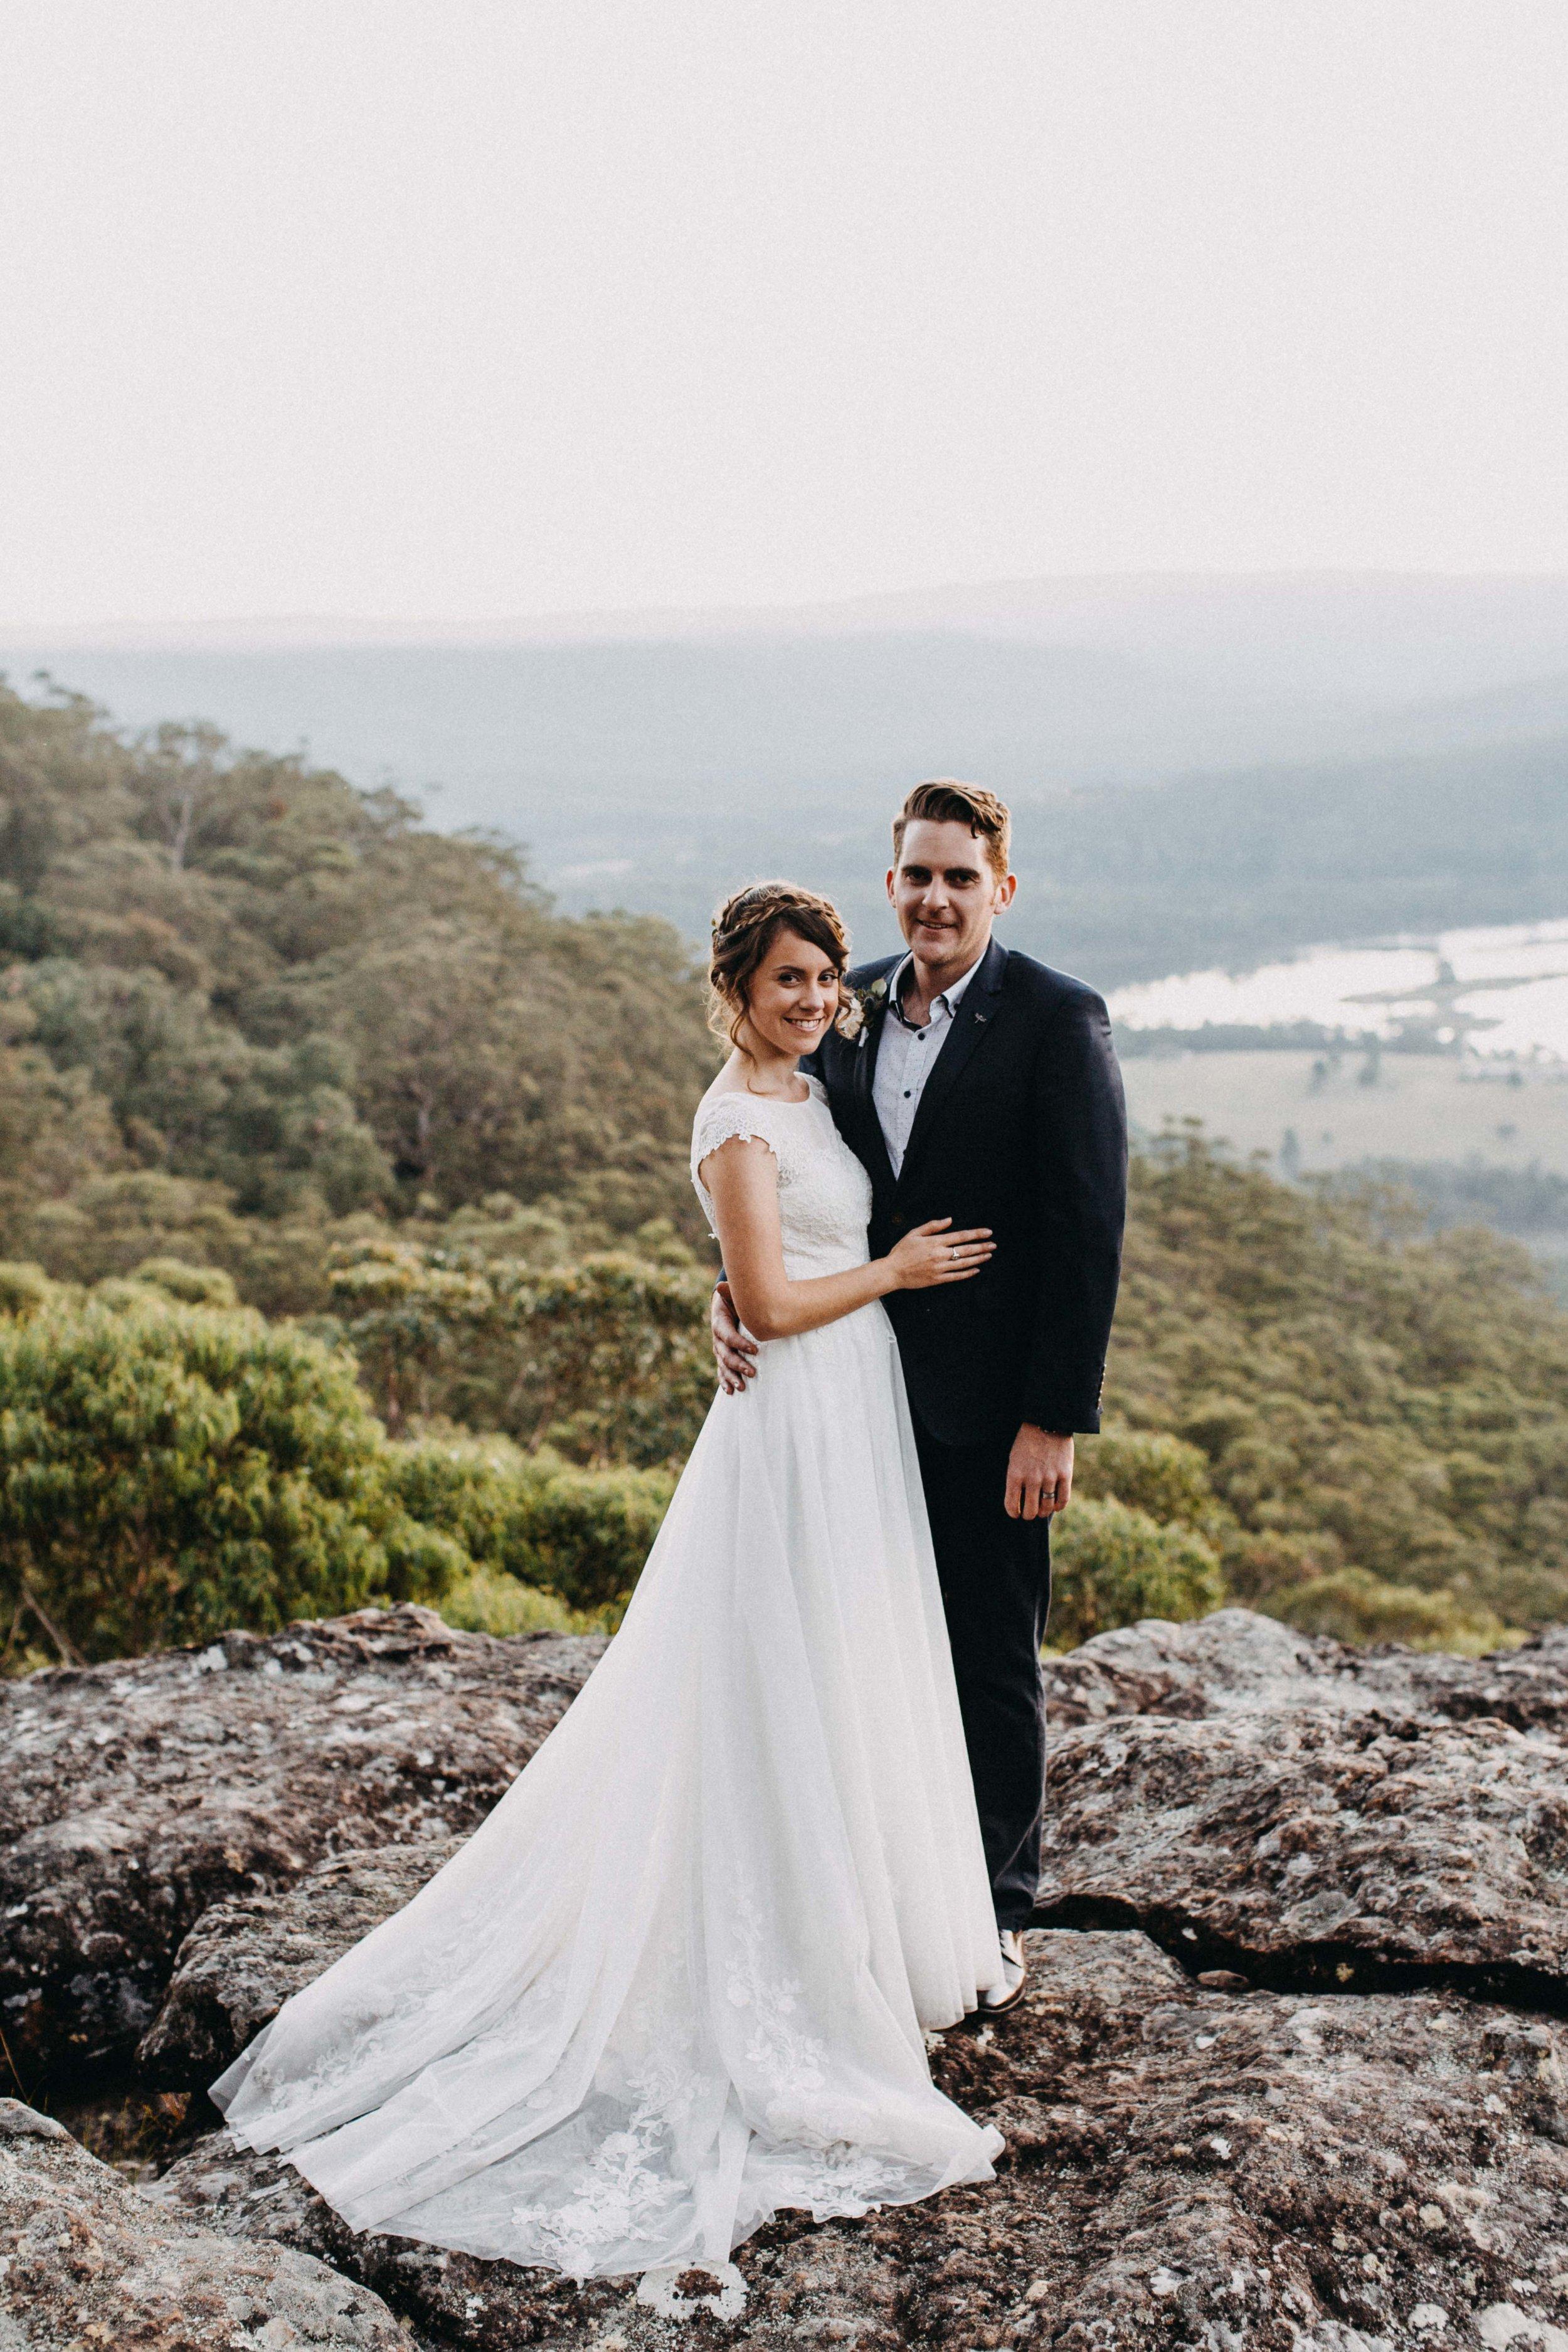 kangaroo-valley-bush-retreat-wedding-lydia-nate-www.emilyobrienphotography.net-140.jpg